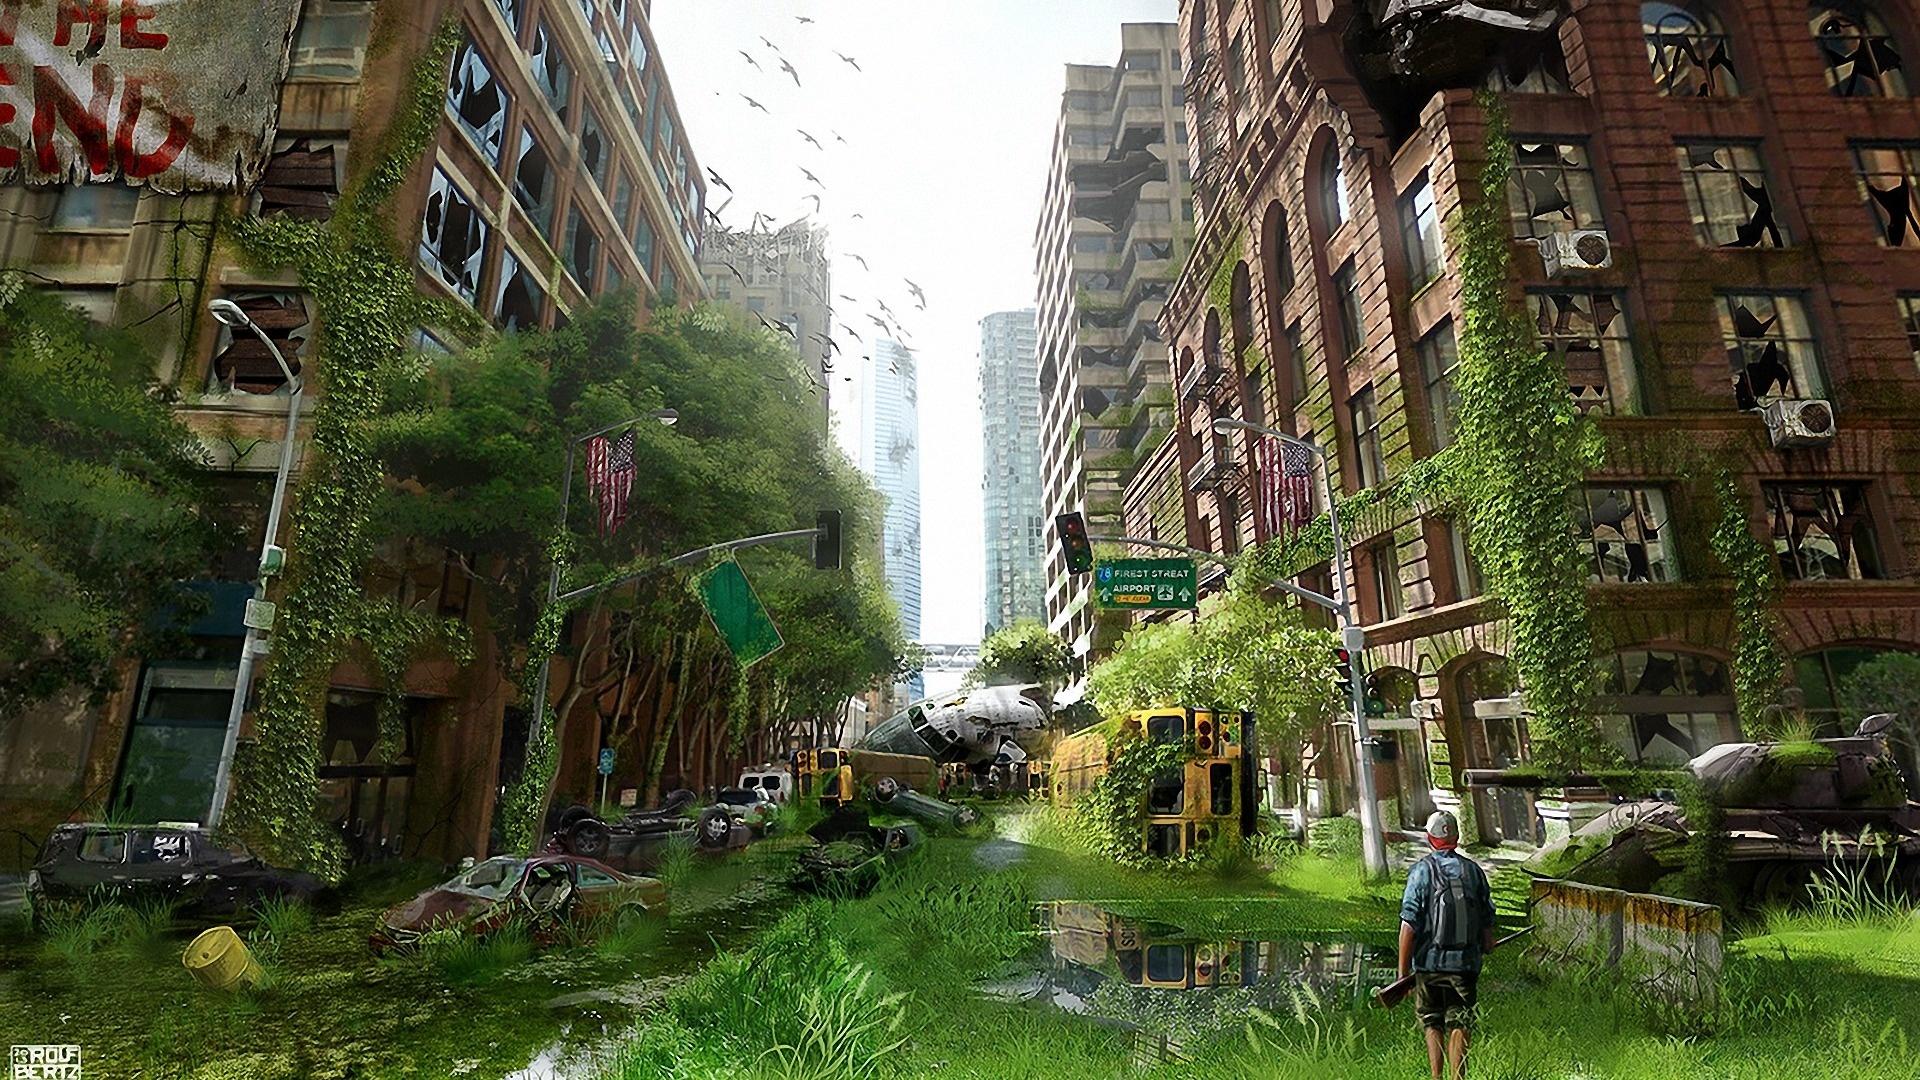 Post Apocalyptic Overgrown City free photo